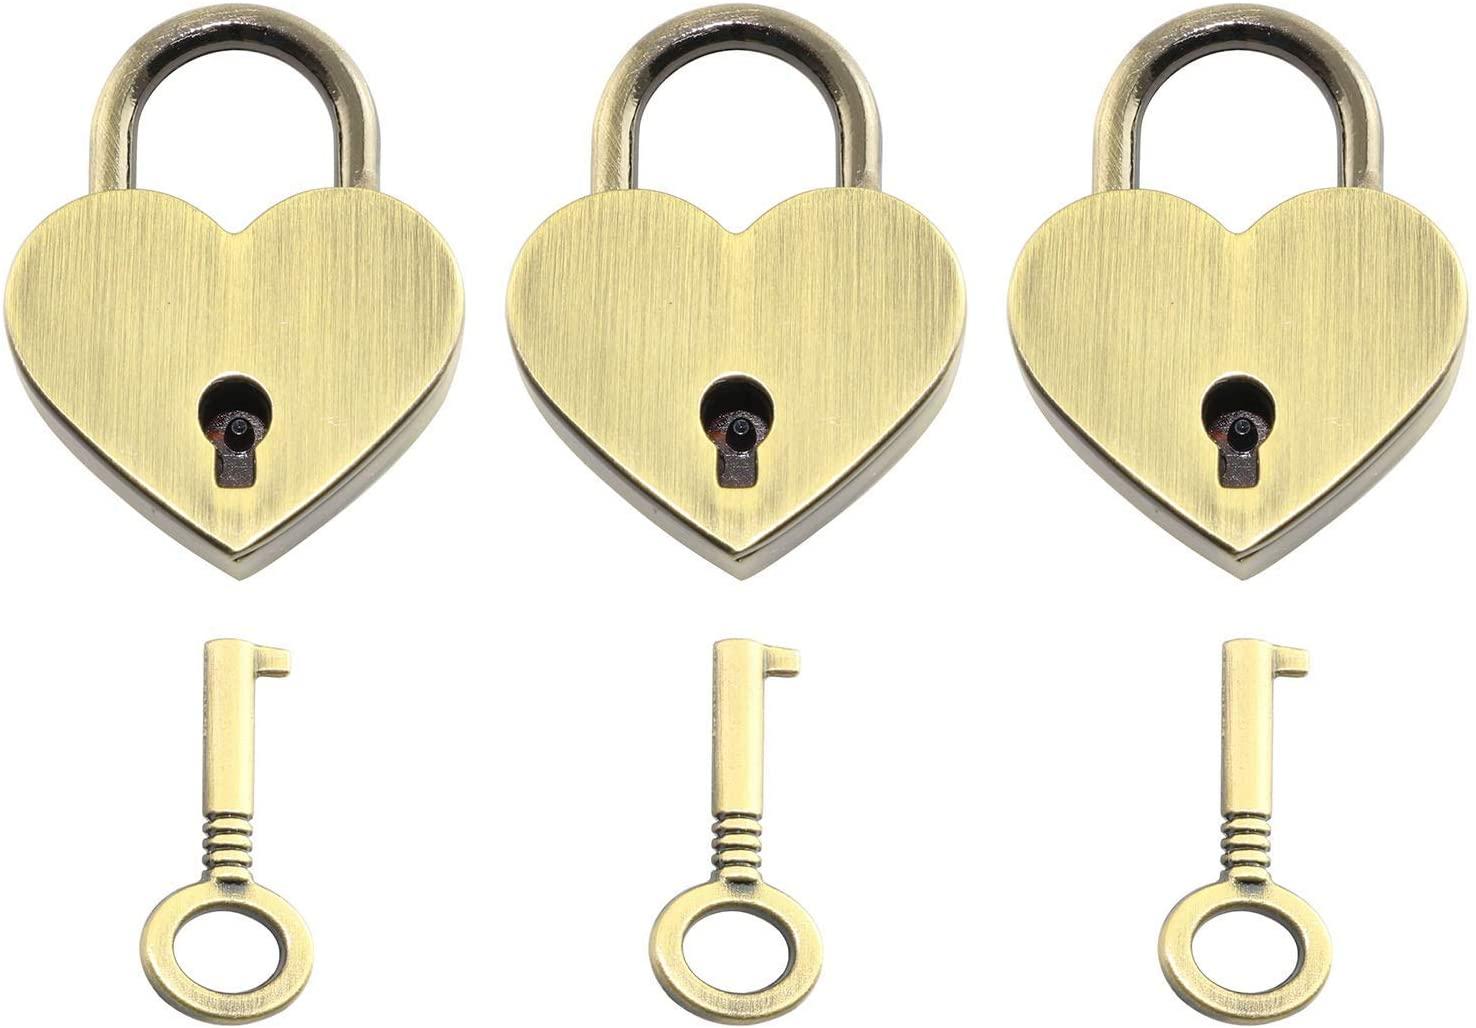 Weyoo 3pcs Small Metal Heart Shaped Padlock Mini Lock with Key for Jewelry Box Storage Box Diary Book (Brass)